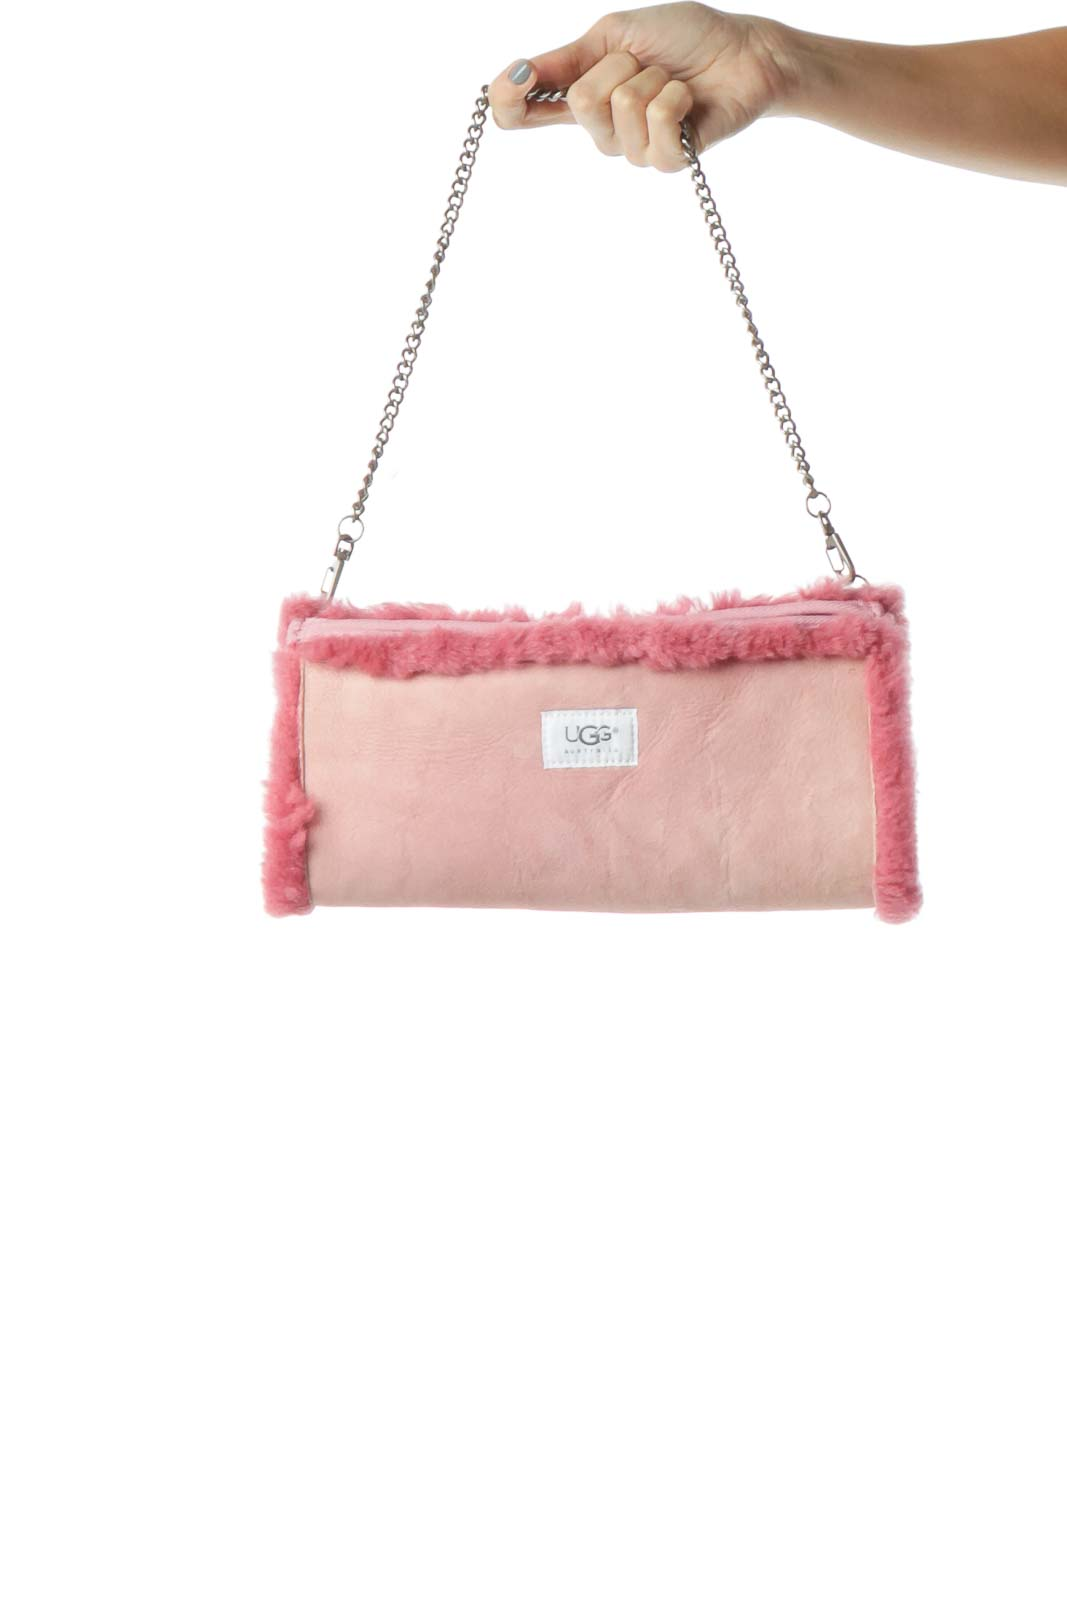 Pink Sheepskin Suede Clutch with Metal Strap